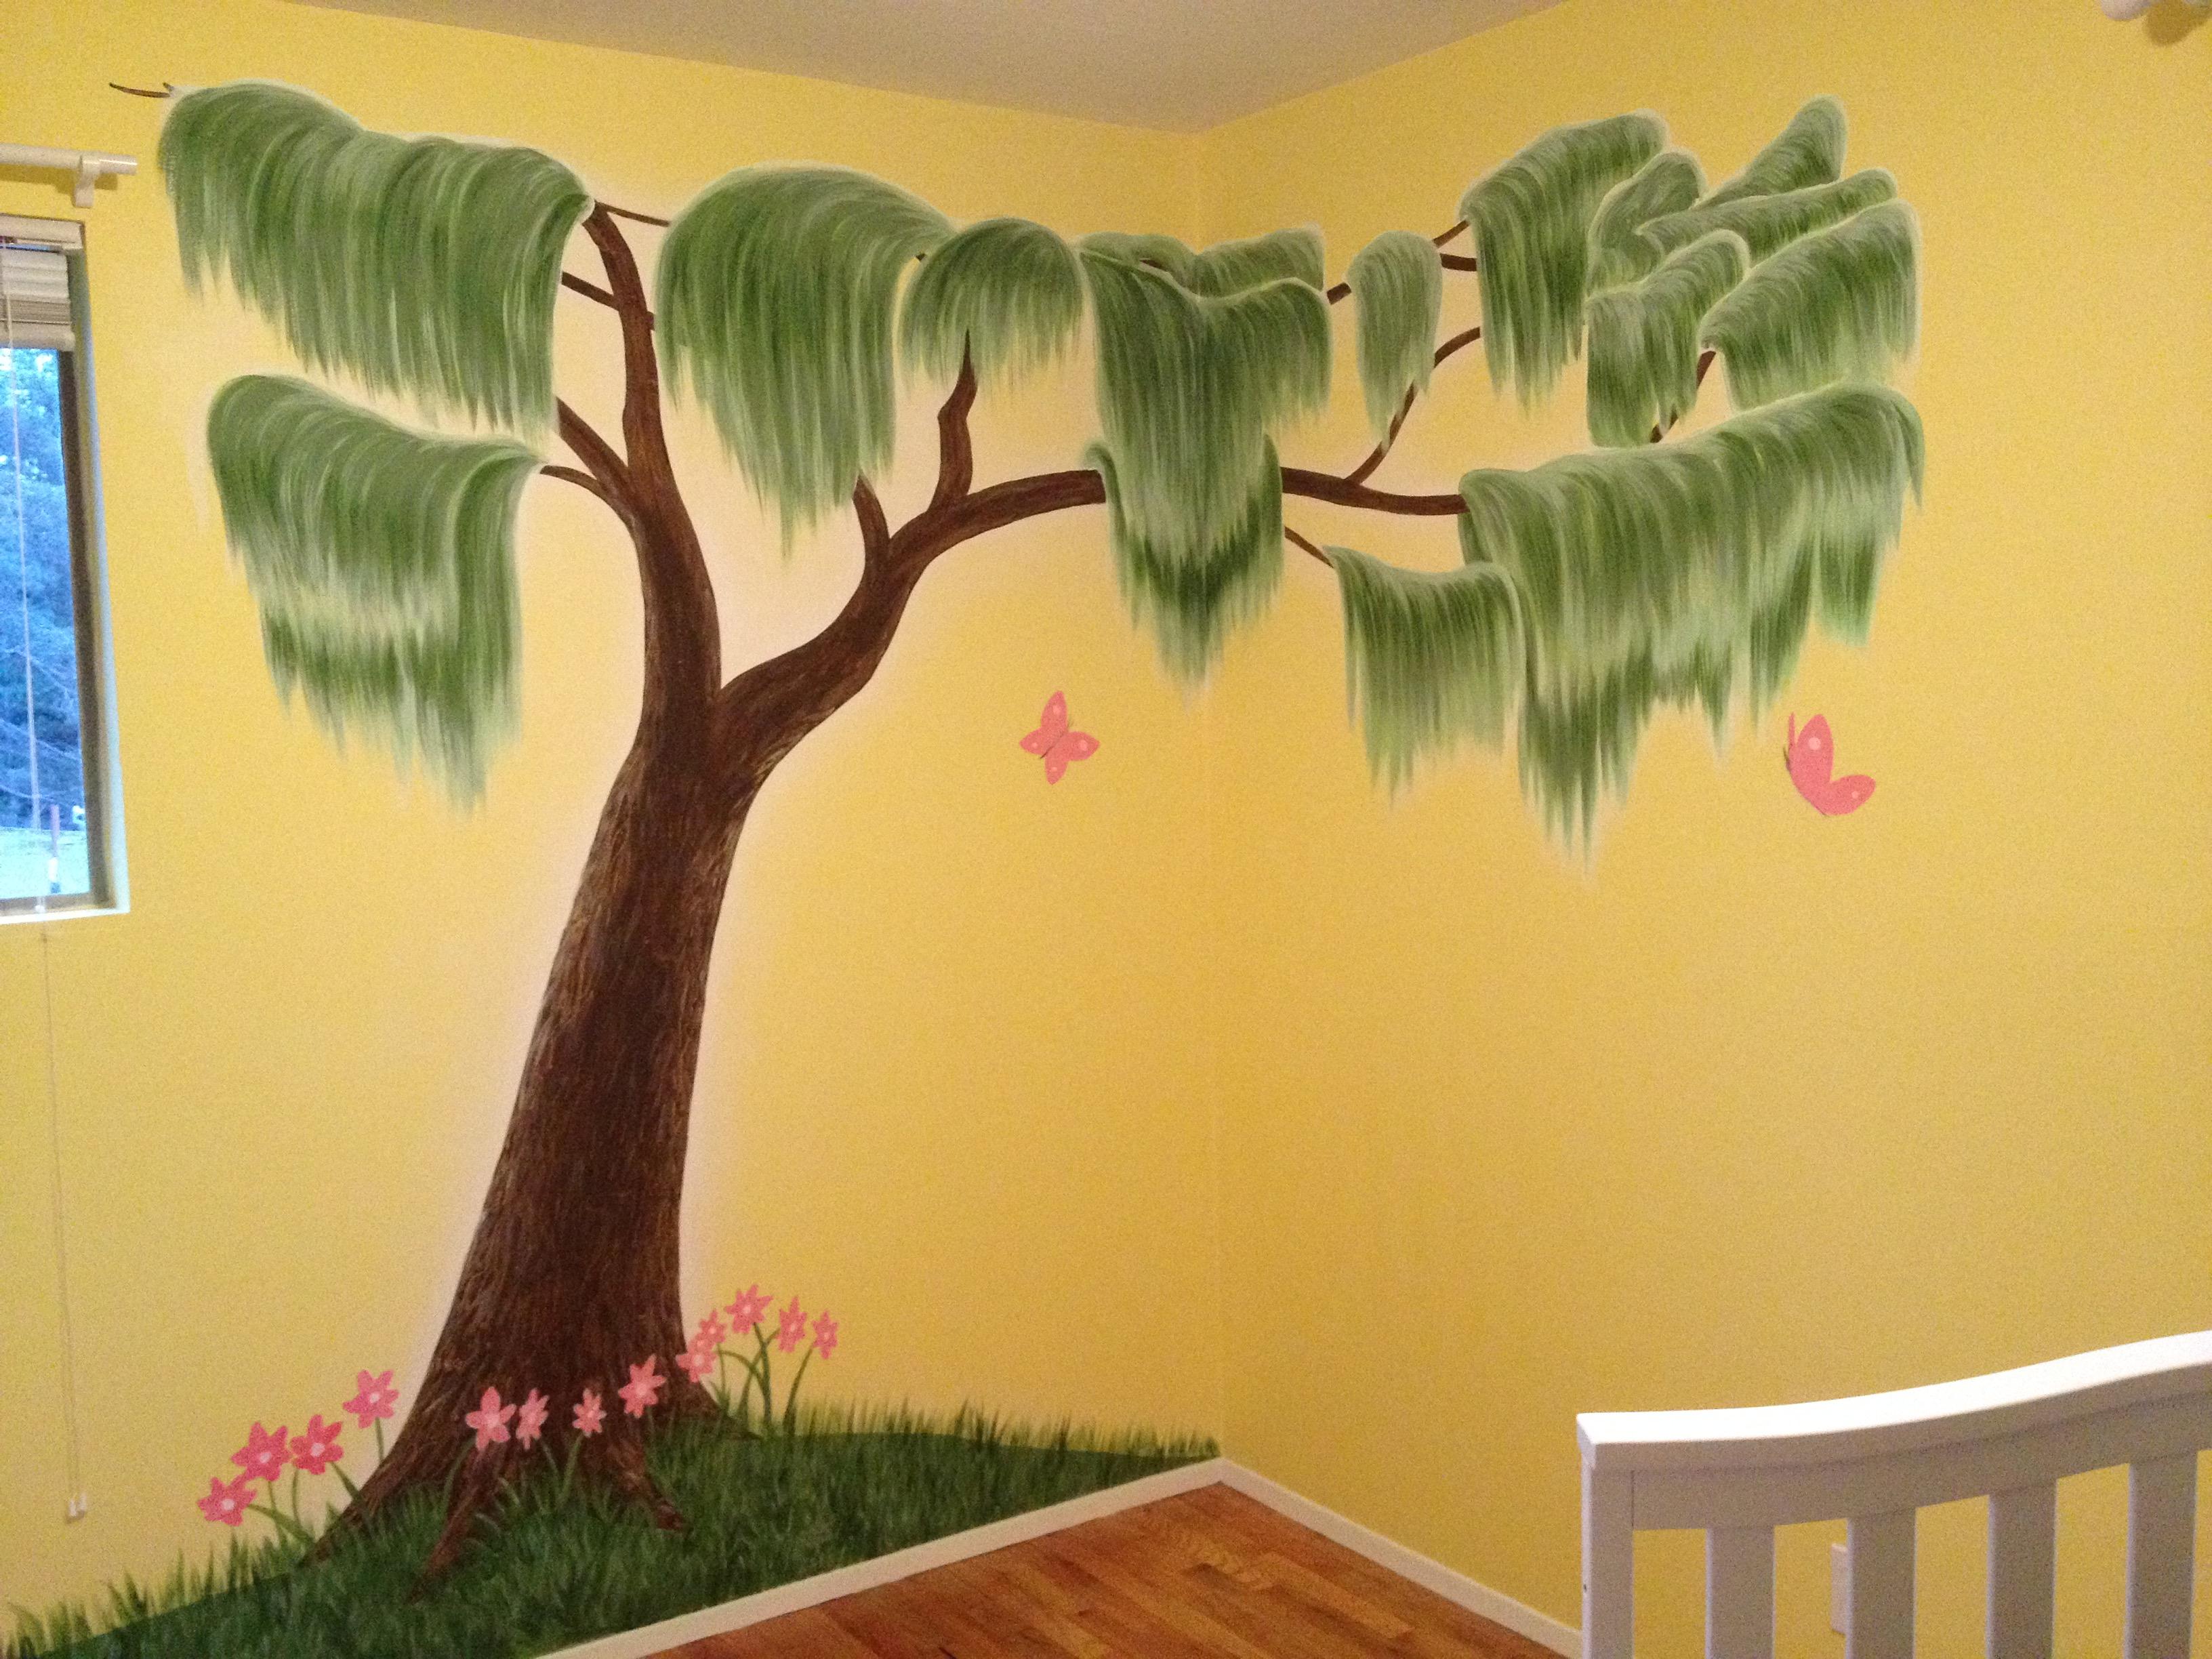 Willow tree mural by Tamara Hergert